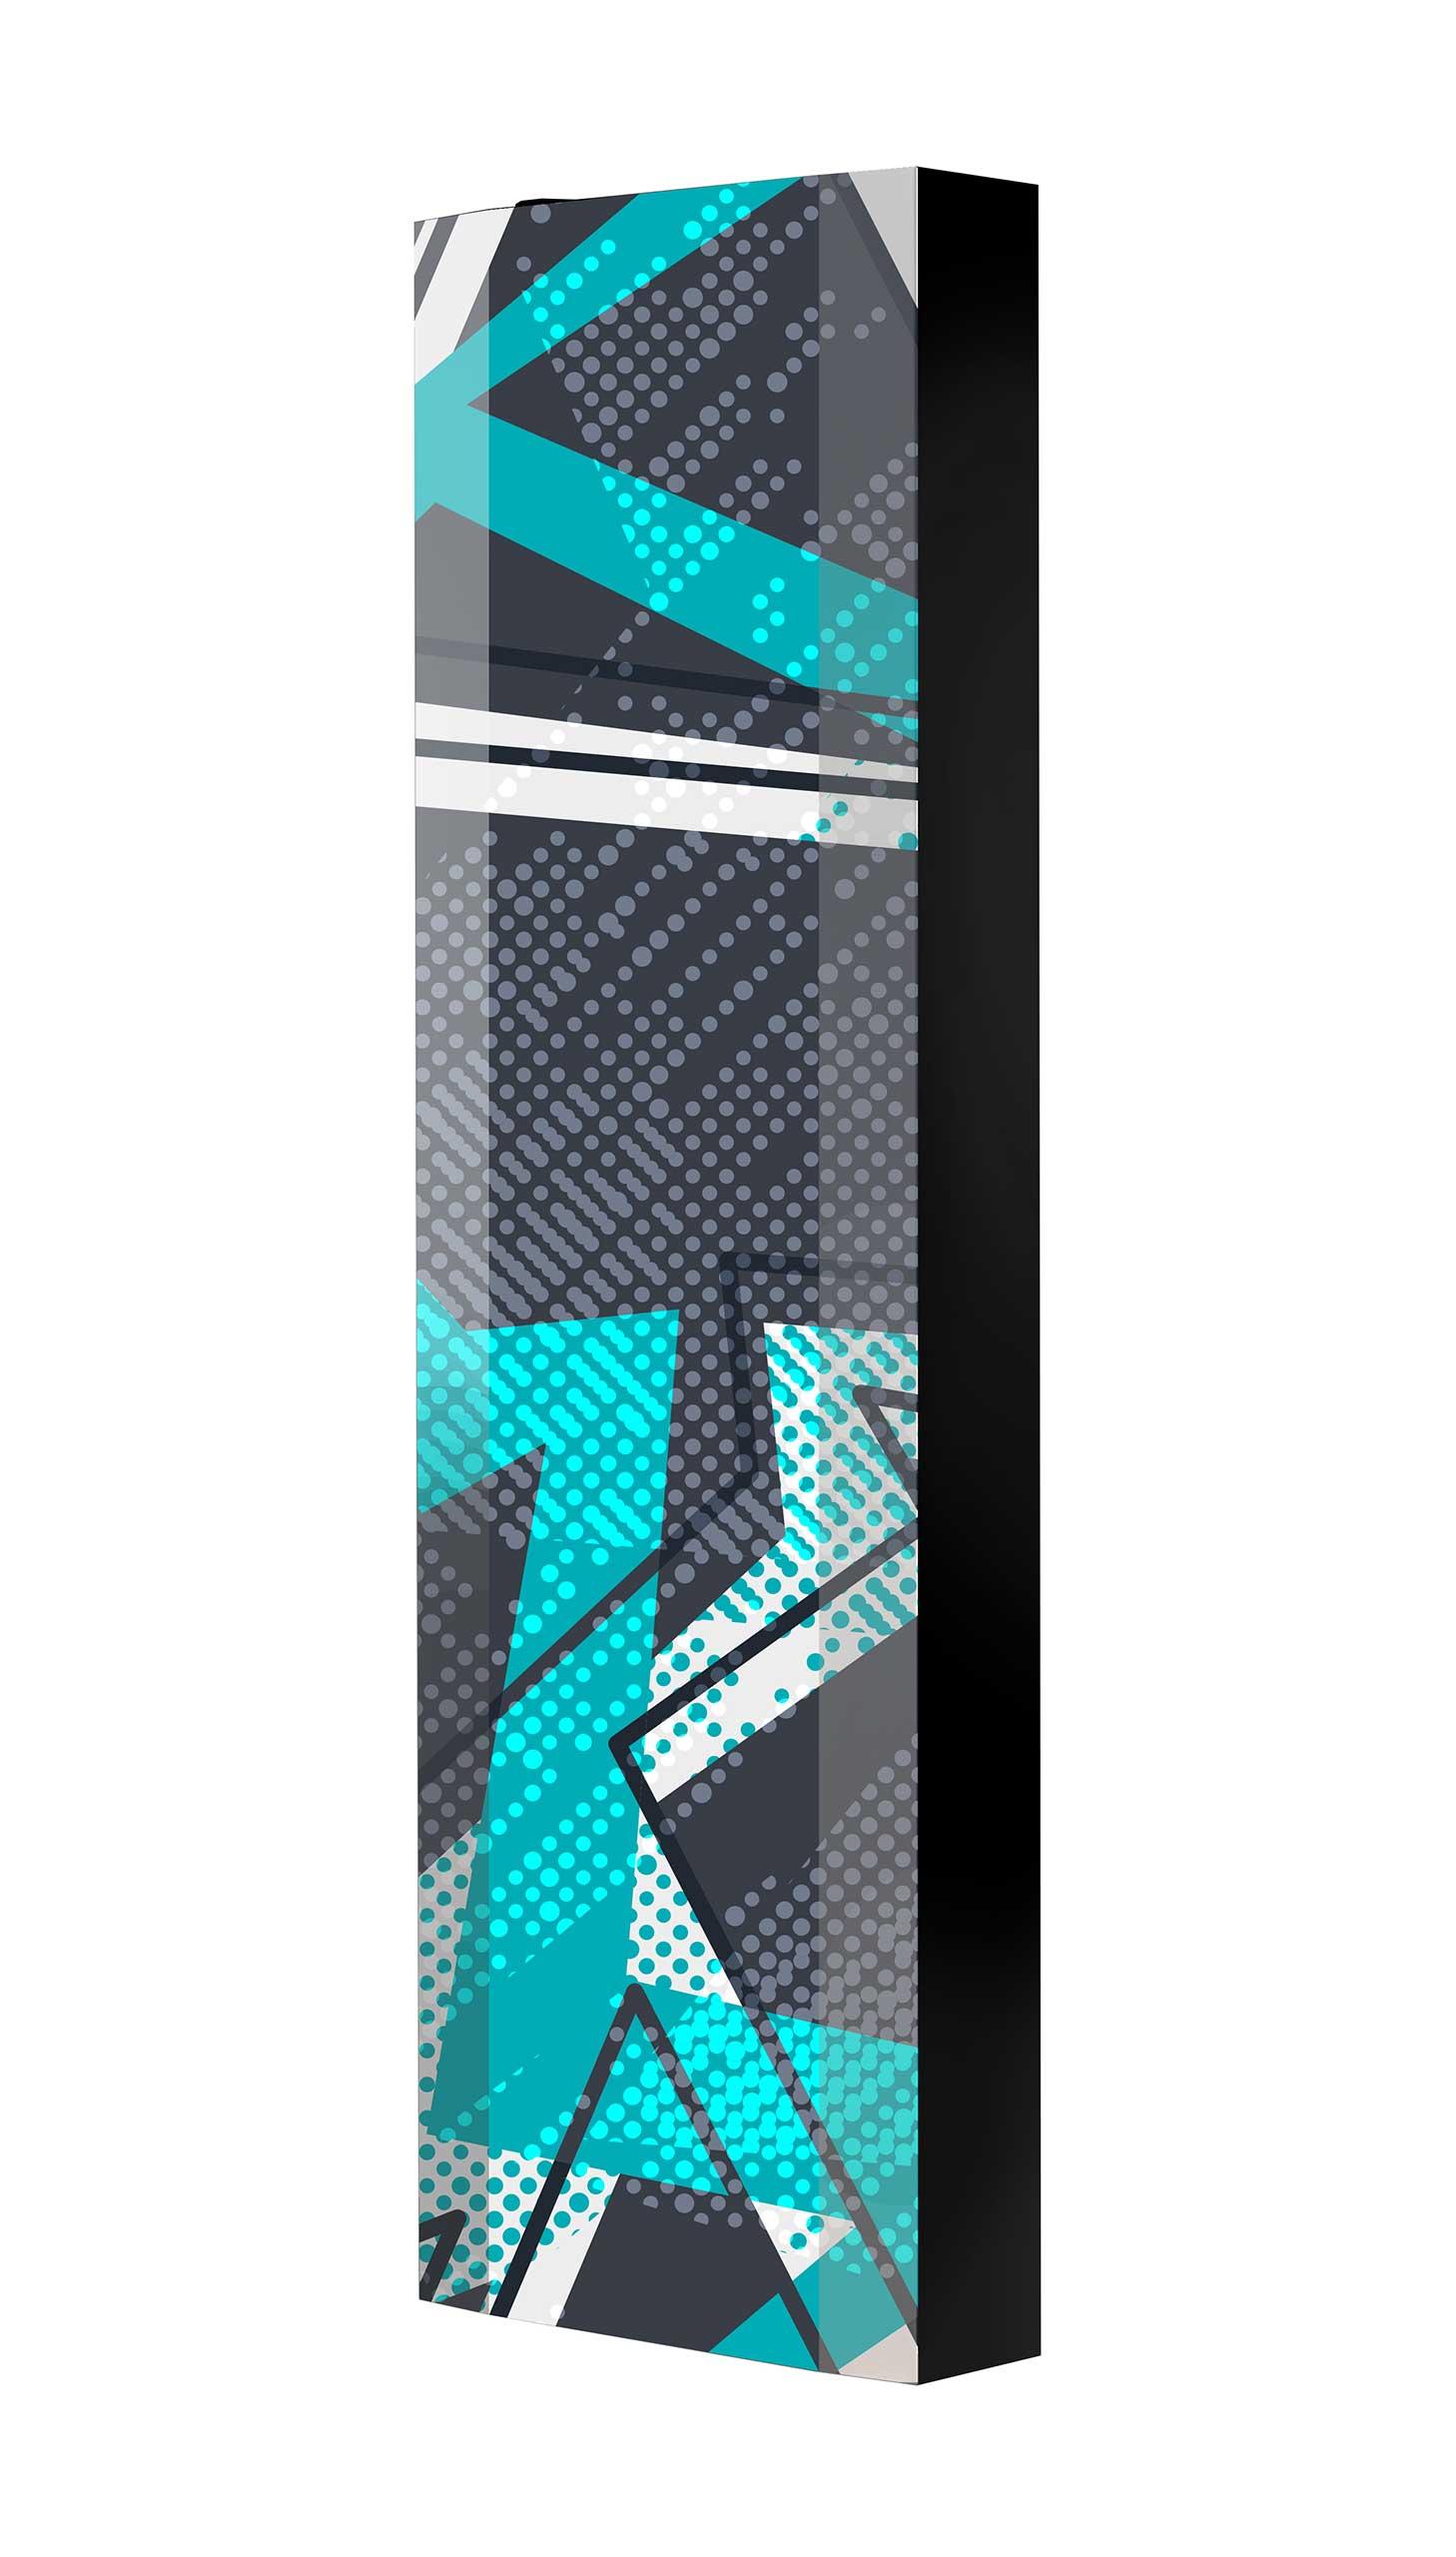 Schuhschrank FLASH 450 BLACK-EDITION Motivschrank schwarz drehbar M138 Graffiti